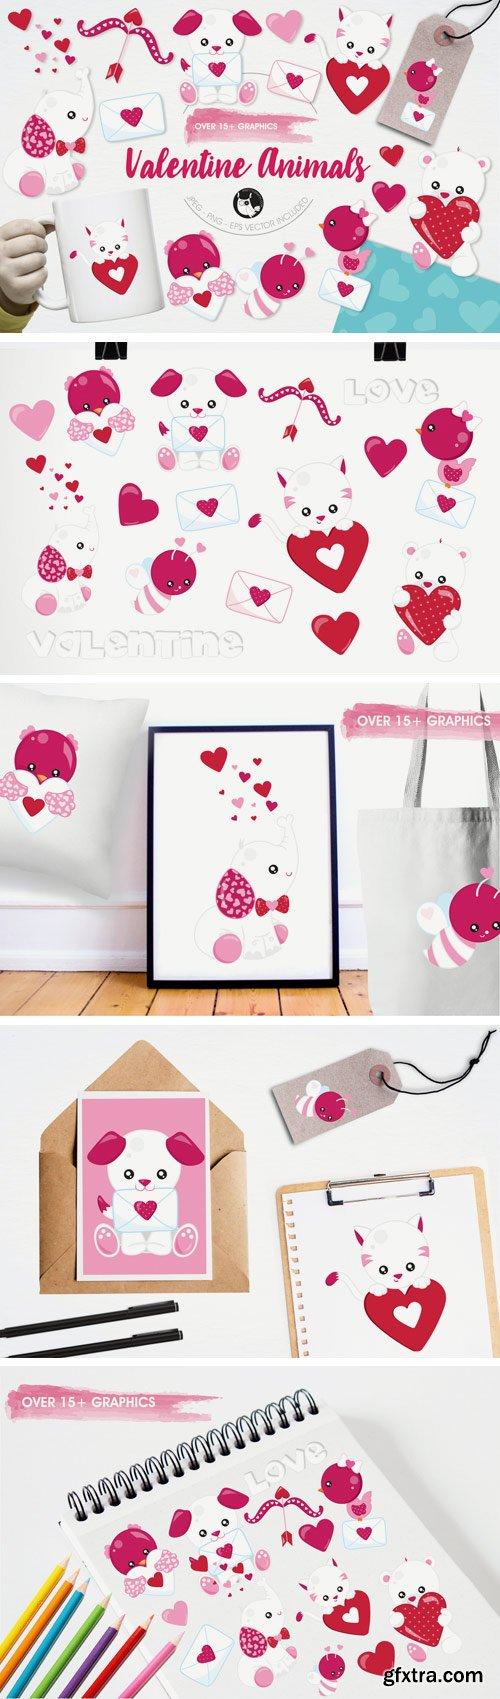 Designbundles - Valentine Animals Graphics and Illustrations 14606